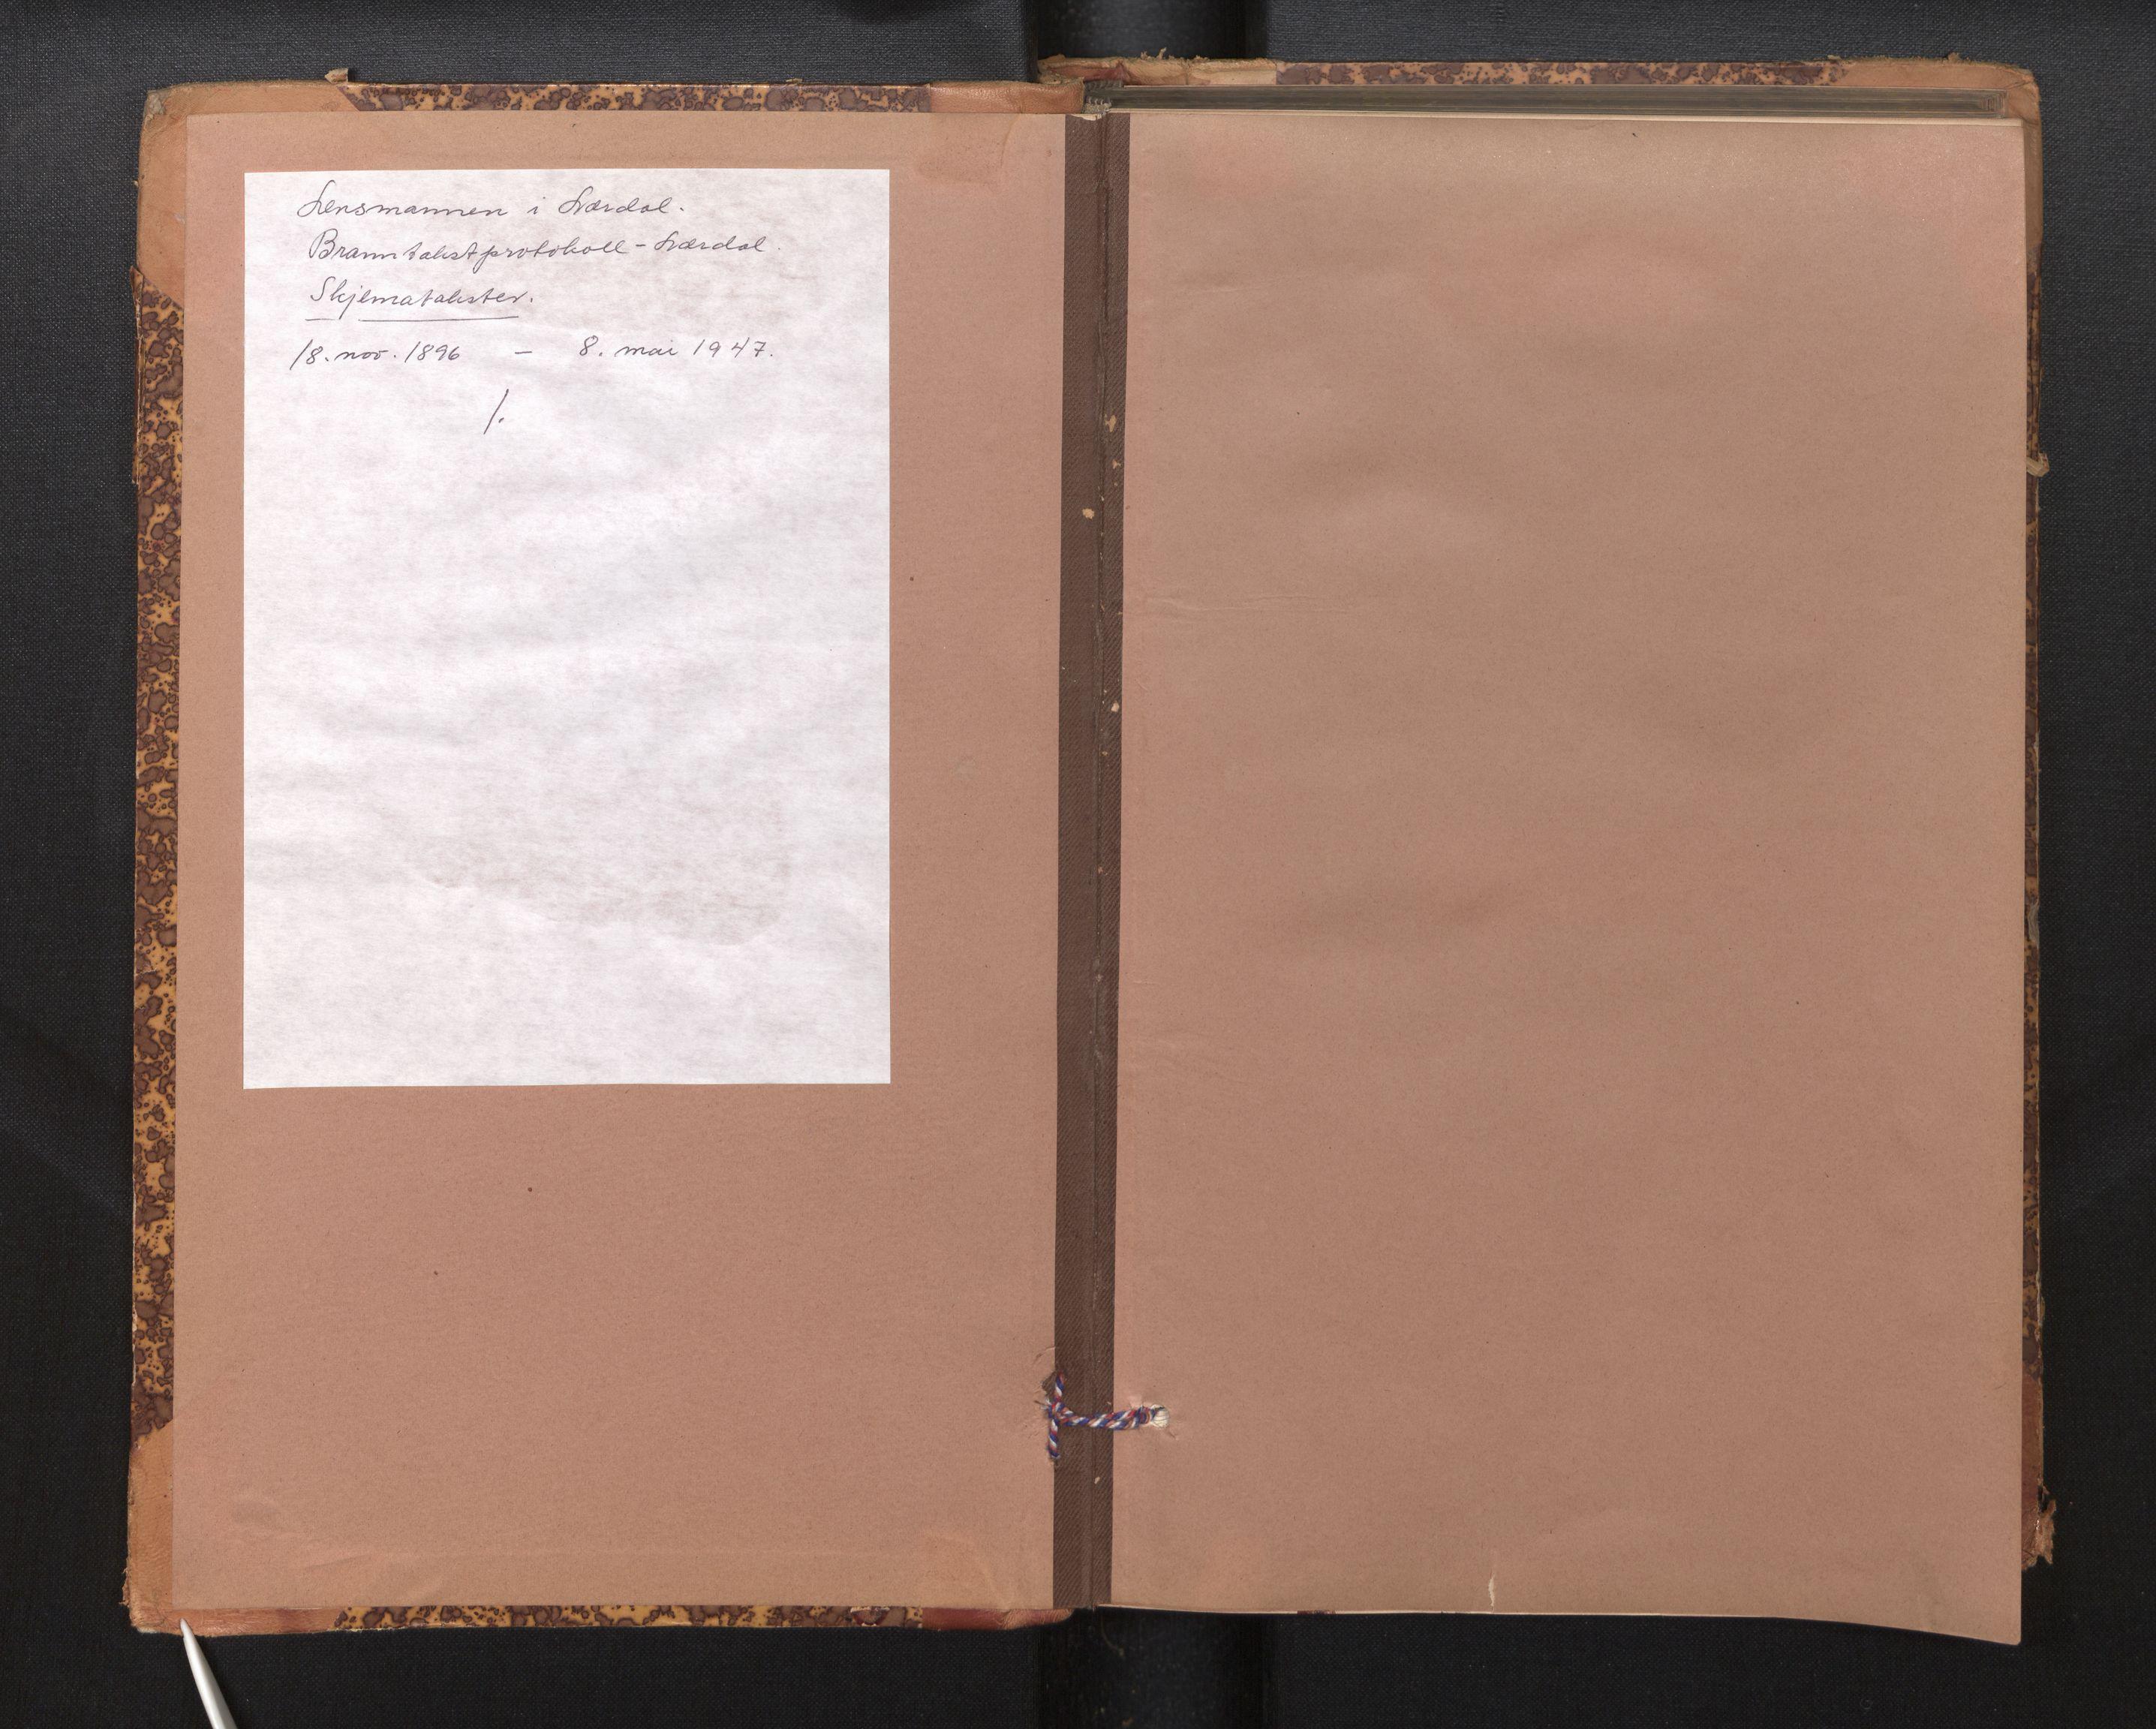 SAB, Lensmannen i Lærdal, 0012/L0006: Branntakstprotokoll, skjematakst, 1896-1947